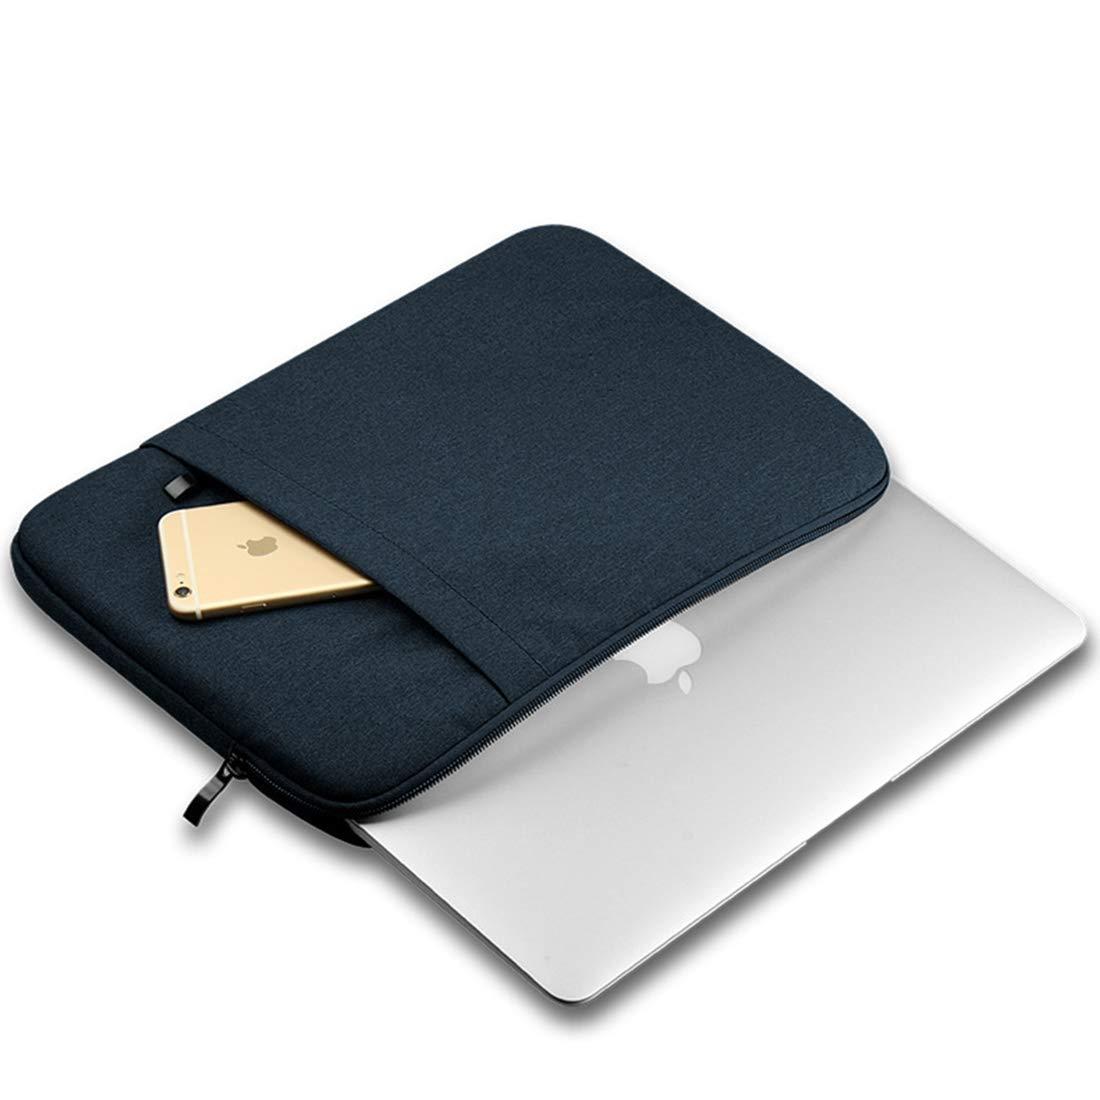 Mkulxina Bolsillo de Bolsillo Bolsillo de Bolsillo de Protector de poliéster Vertical Impermeable para computadora portátil Compatible con MacBook Pro de 13 Pulgadas, MacBook Air, computadora portátil 7a3886